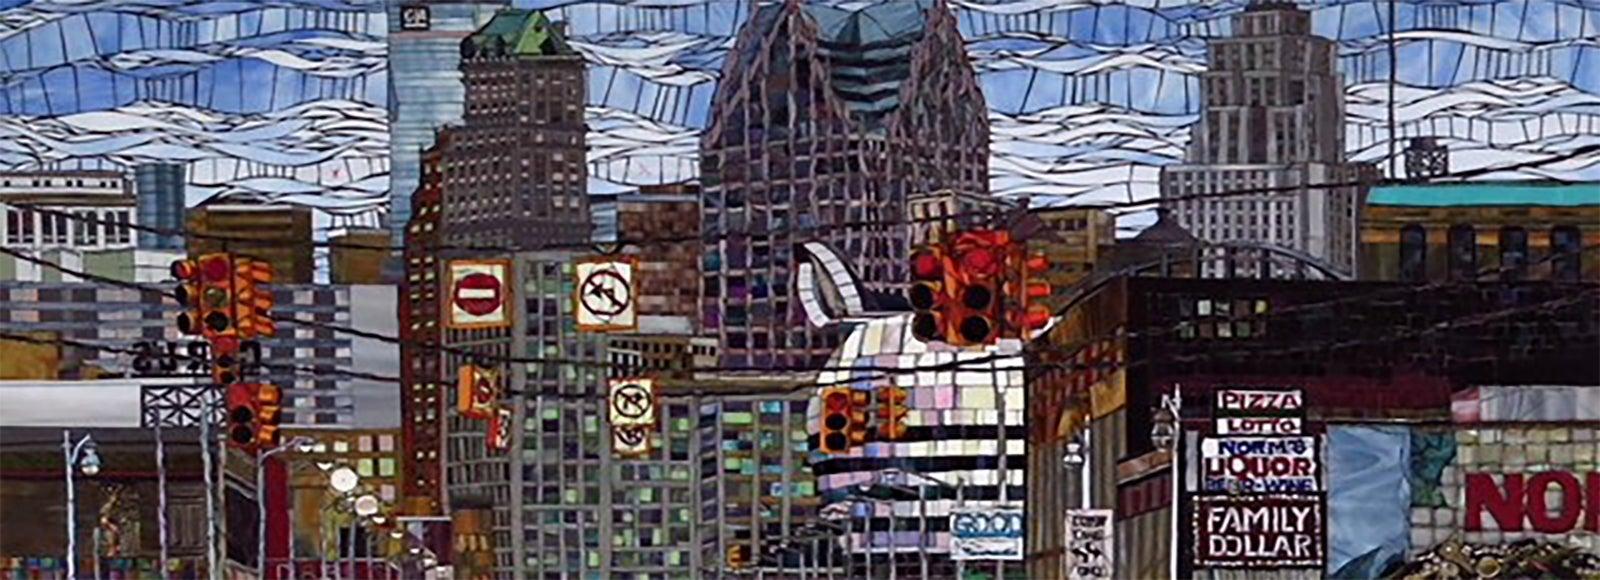 More Info for Unshattered City by Detroit Artist Darcel Deneau Is Installed in TCF Center